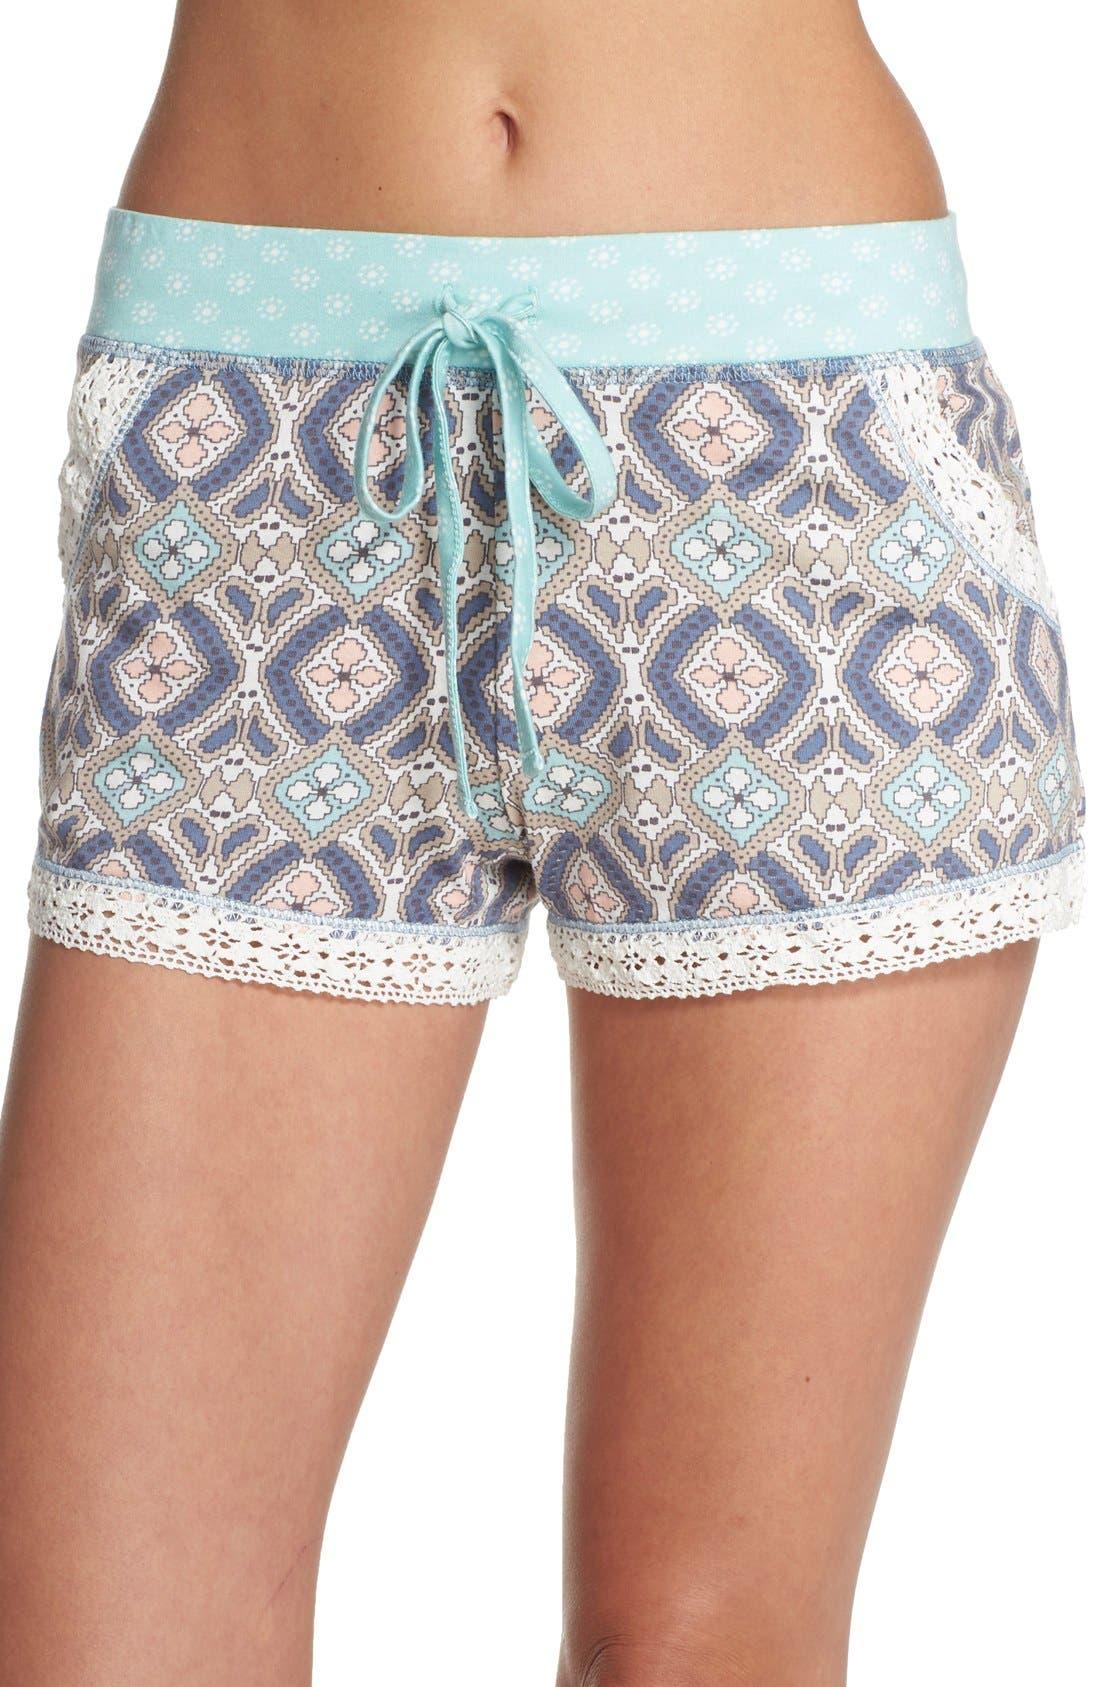 Alternate Image 1 Selected - PJ Salvage 'Miss' Print Pajama Shorts